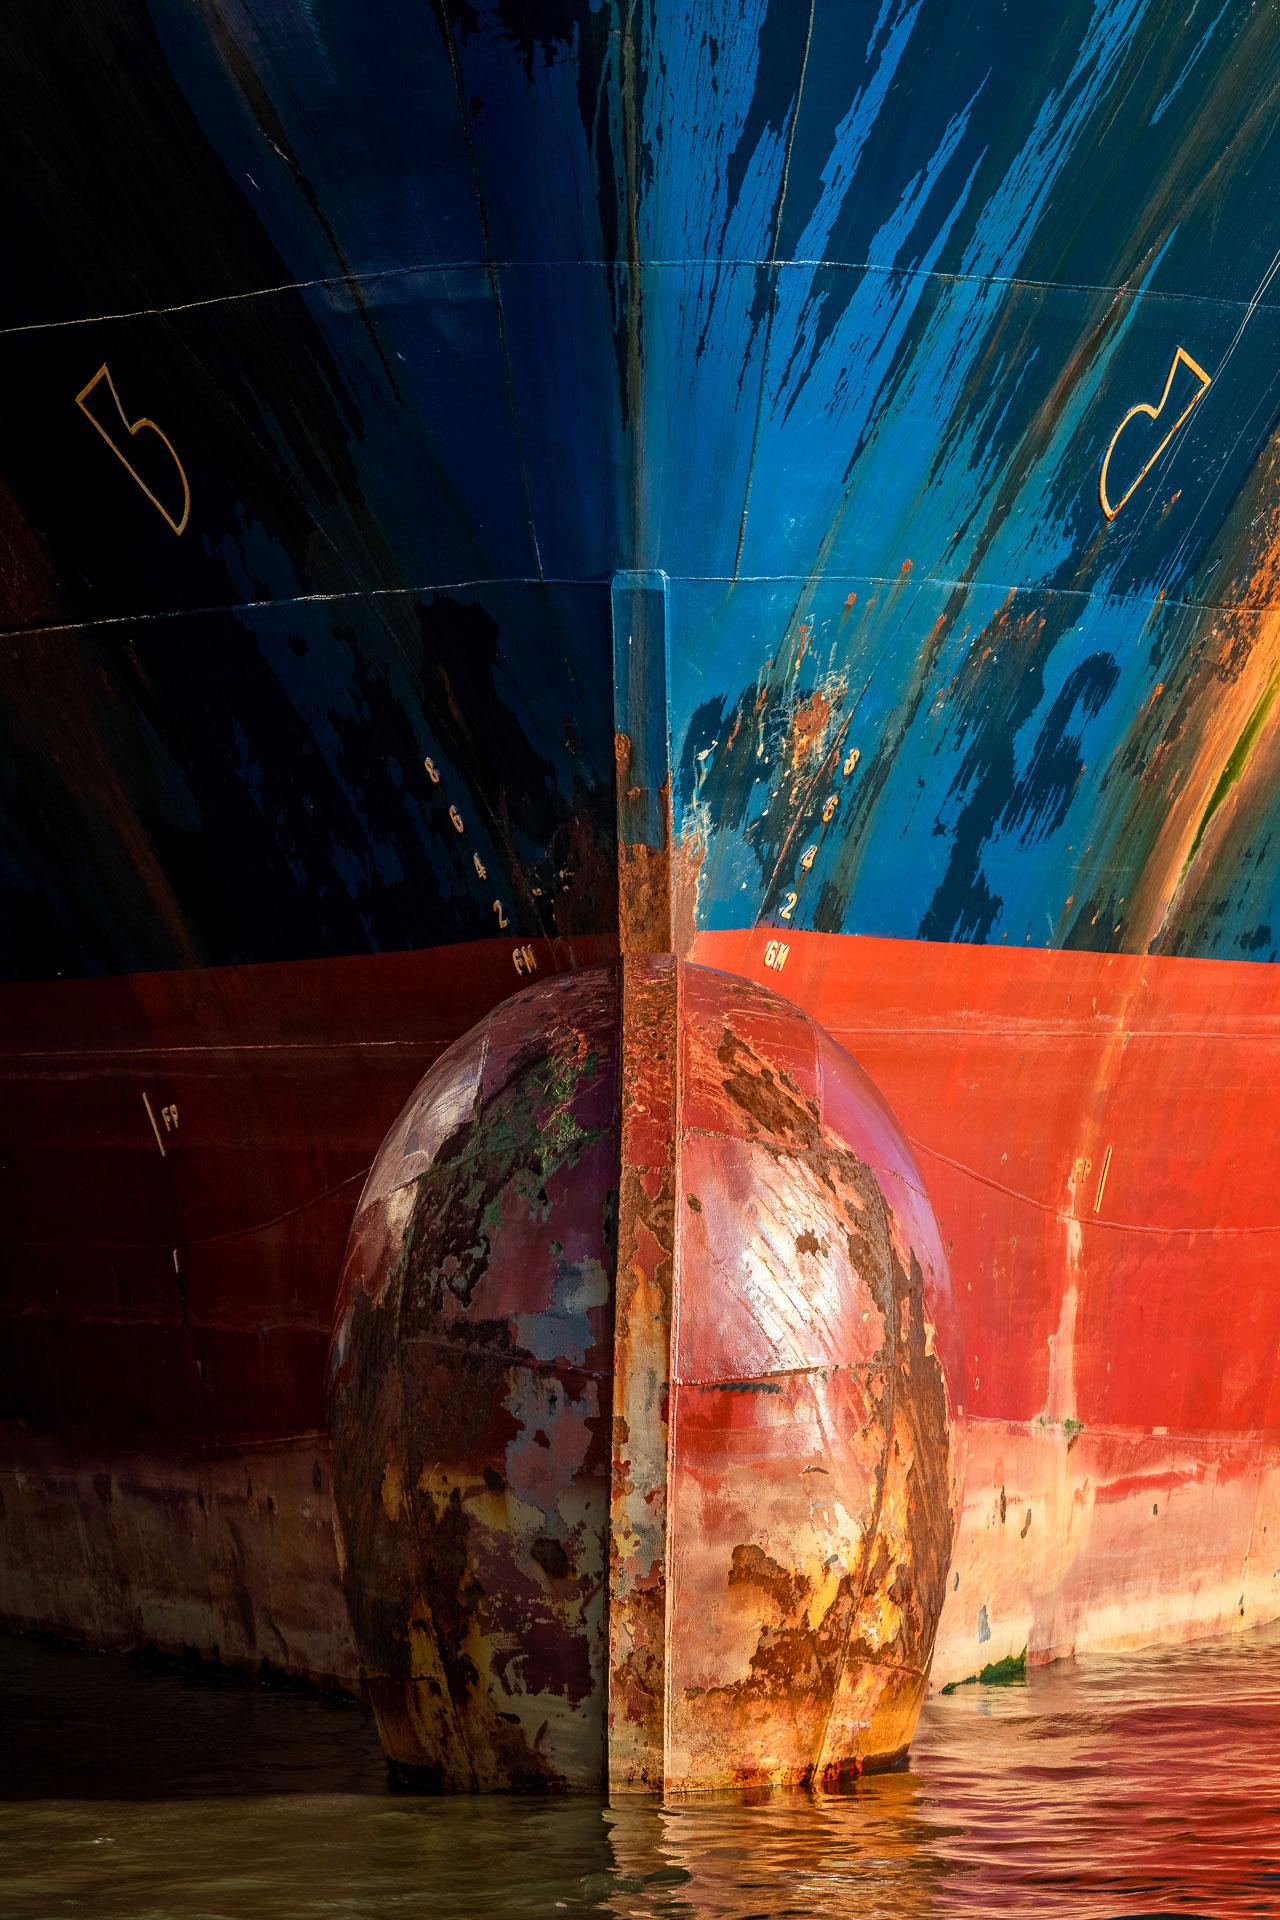 JSH07-bulb-containerschiff-hochformat-wandbild-leinwand-acrylglas-aludibond